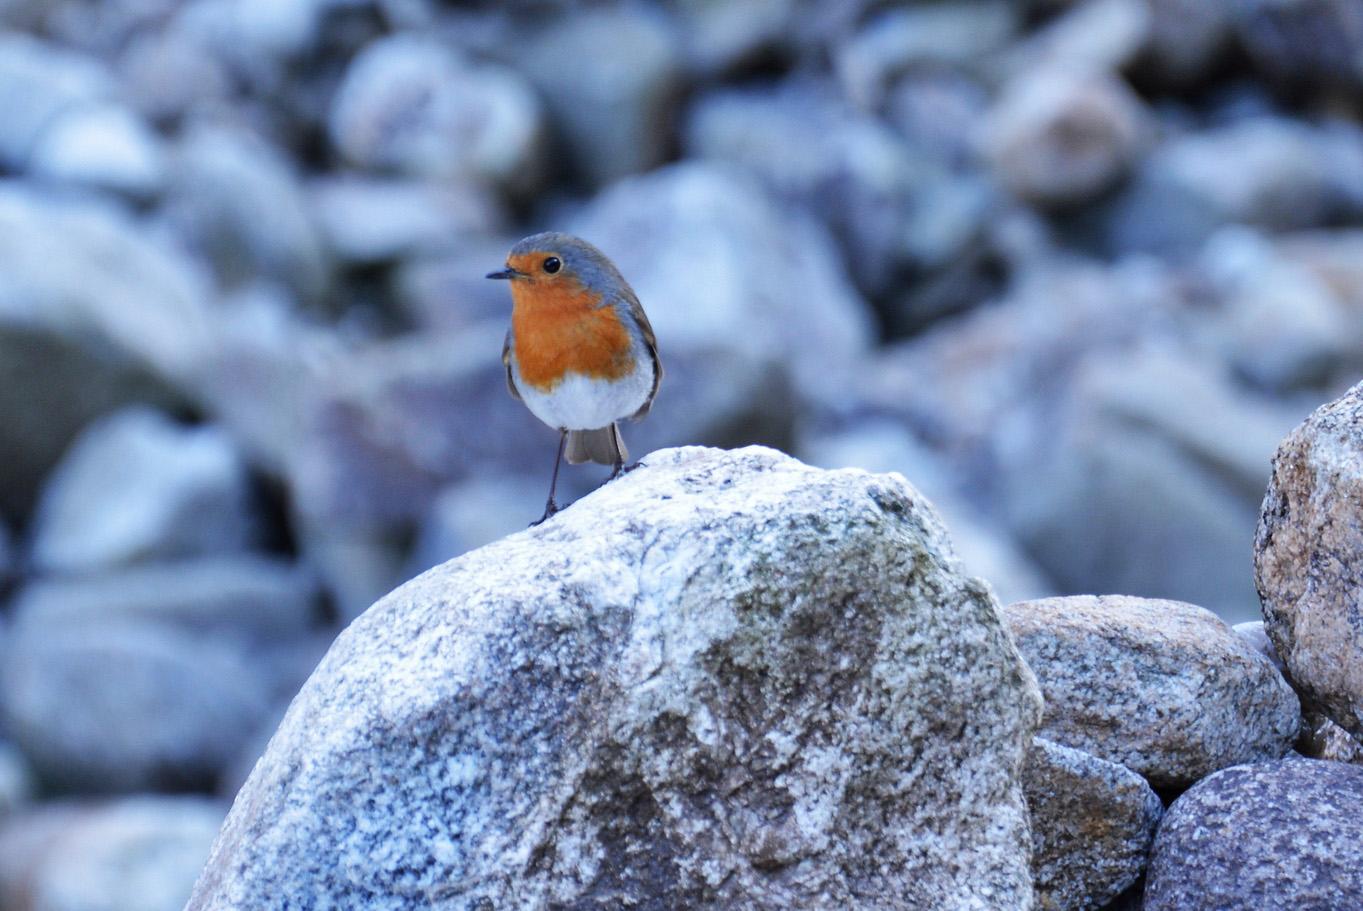 Cute little bird on one of the granite rocks